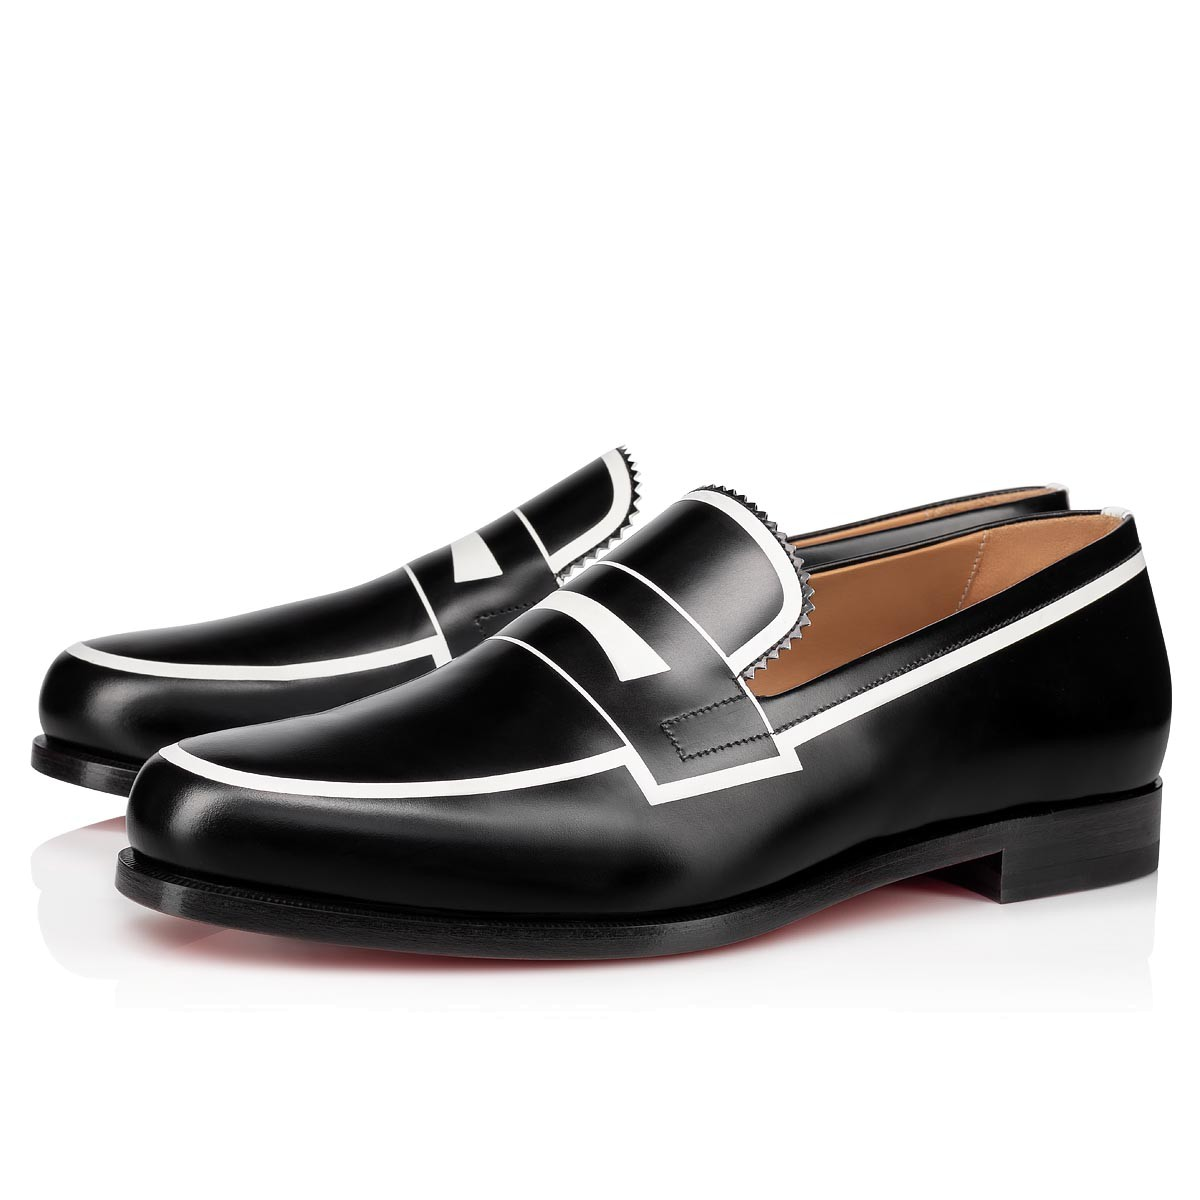 Shoes - Magic Moc Flat - Christian Louboutin